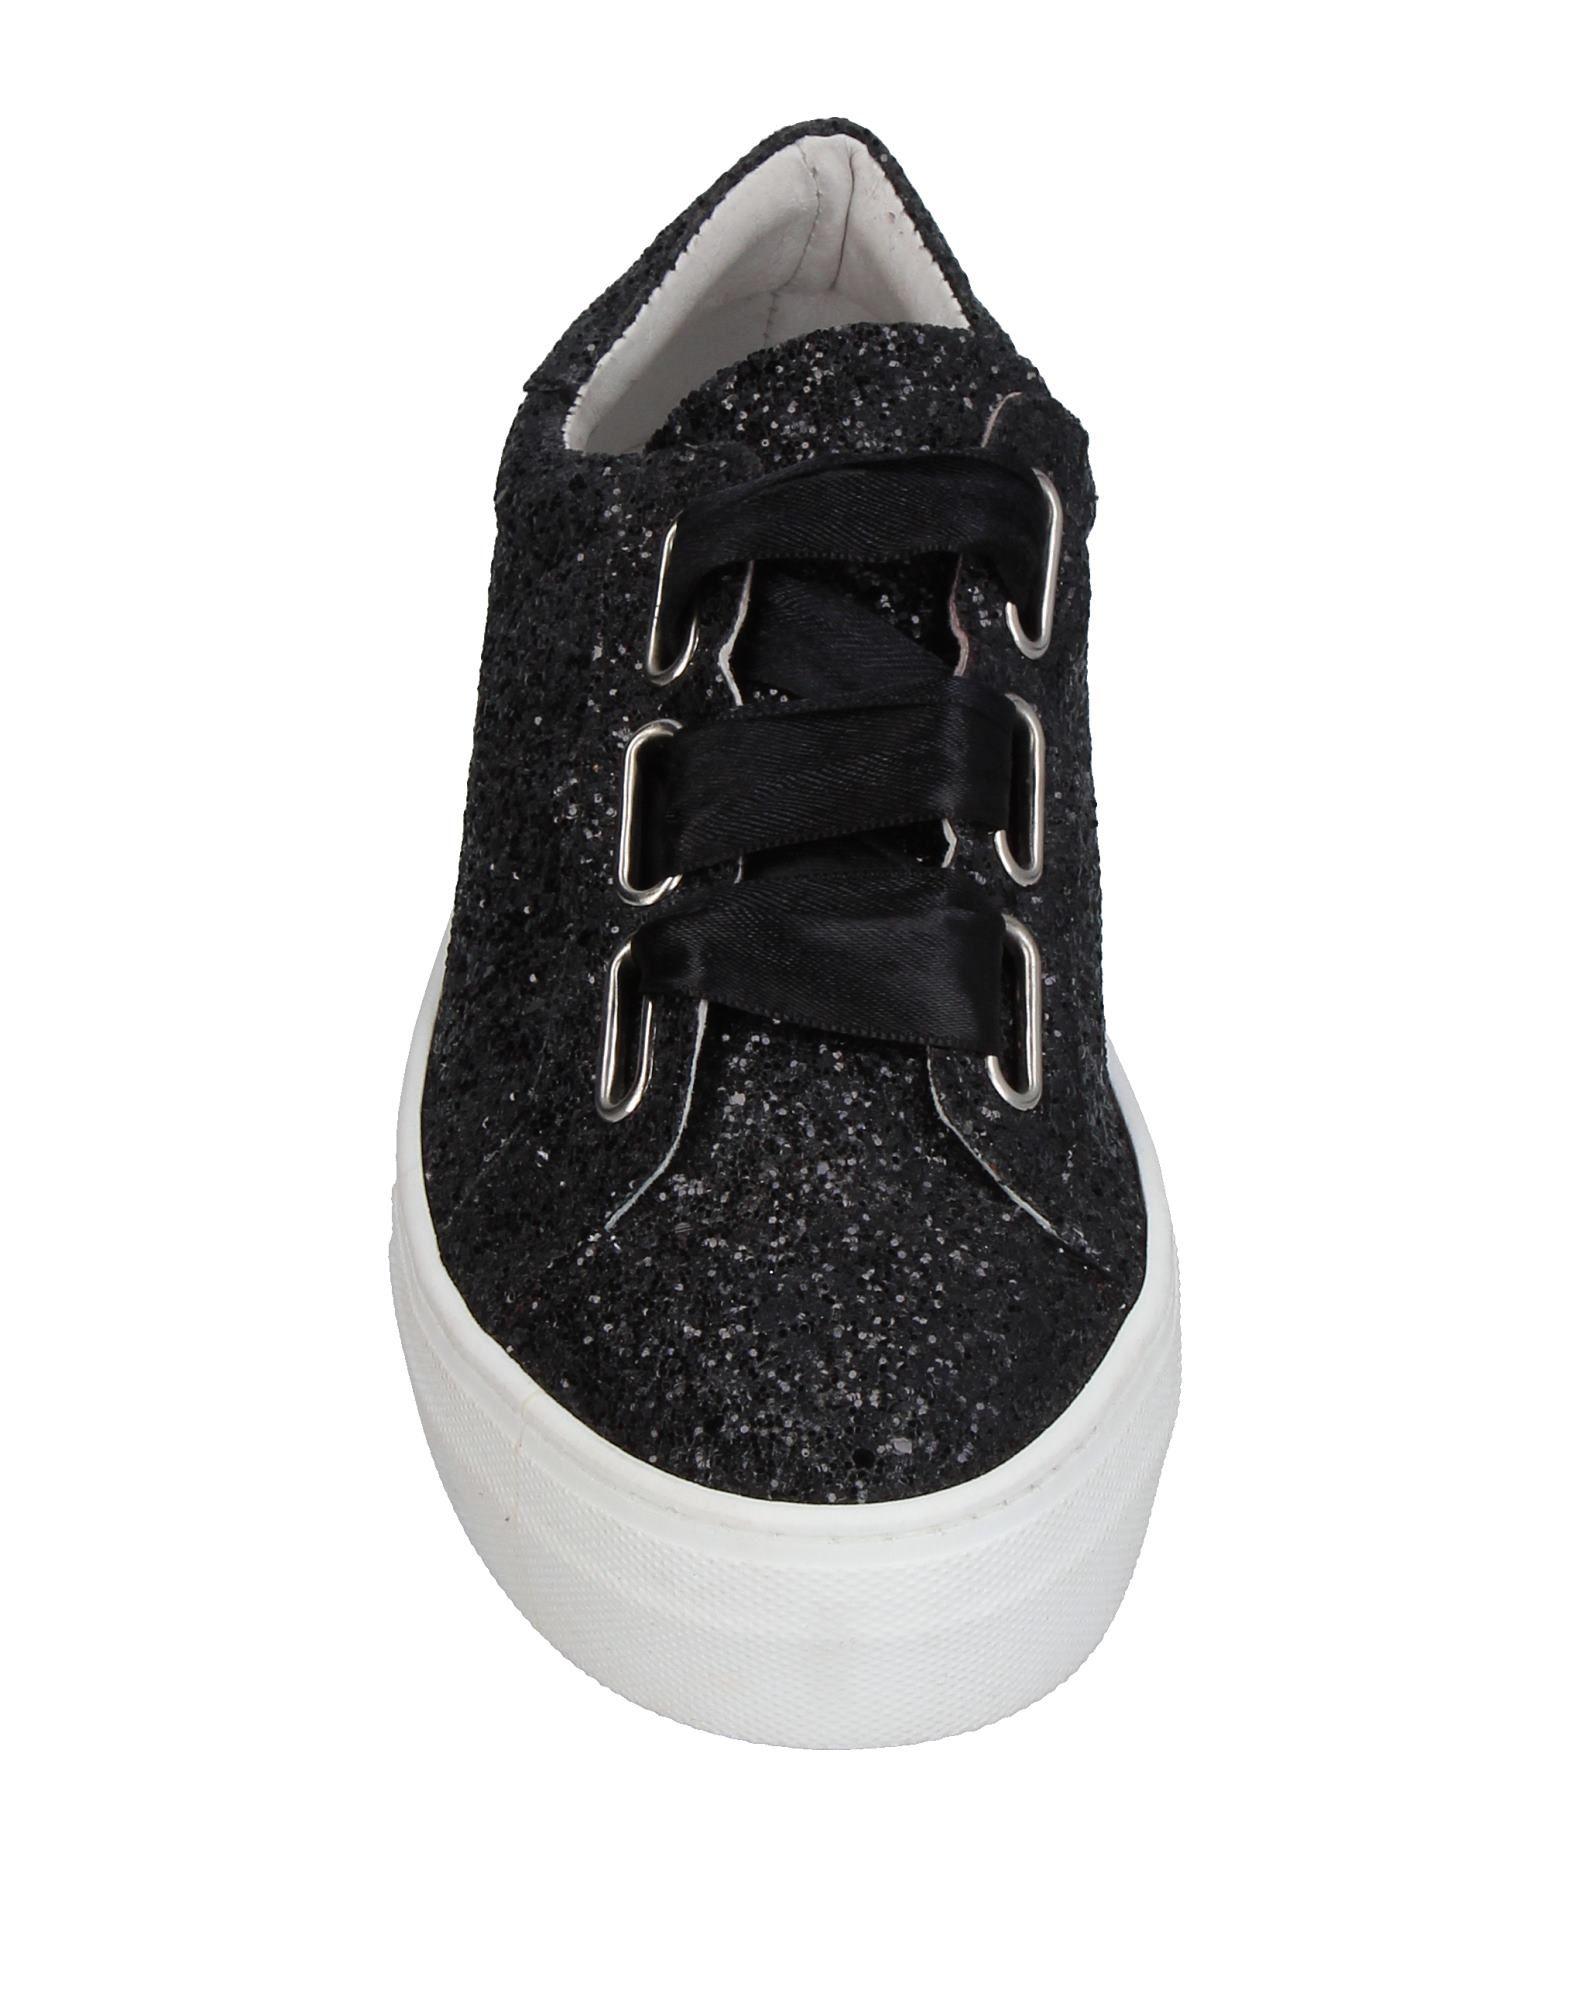 Brawn's Sneakers Damen  11410208XB Gute Qualität beliebte Schuhe